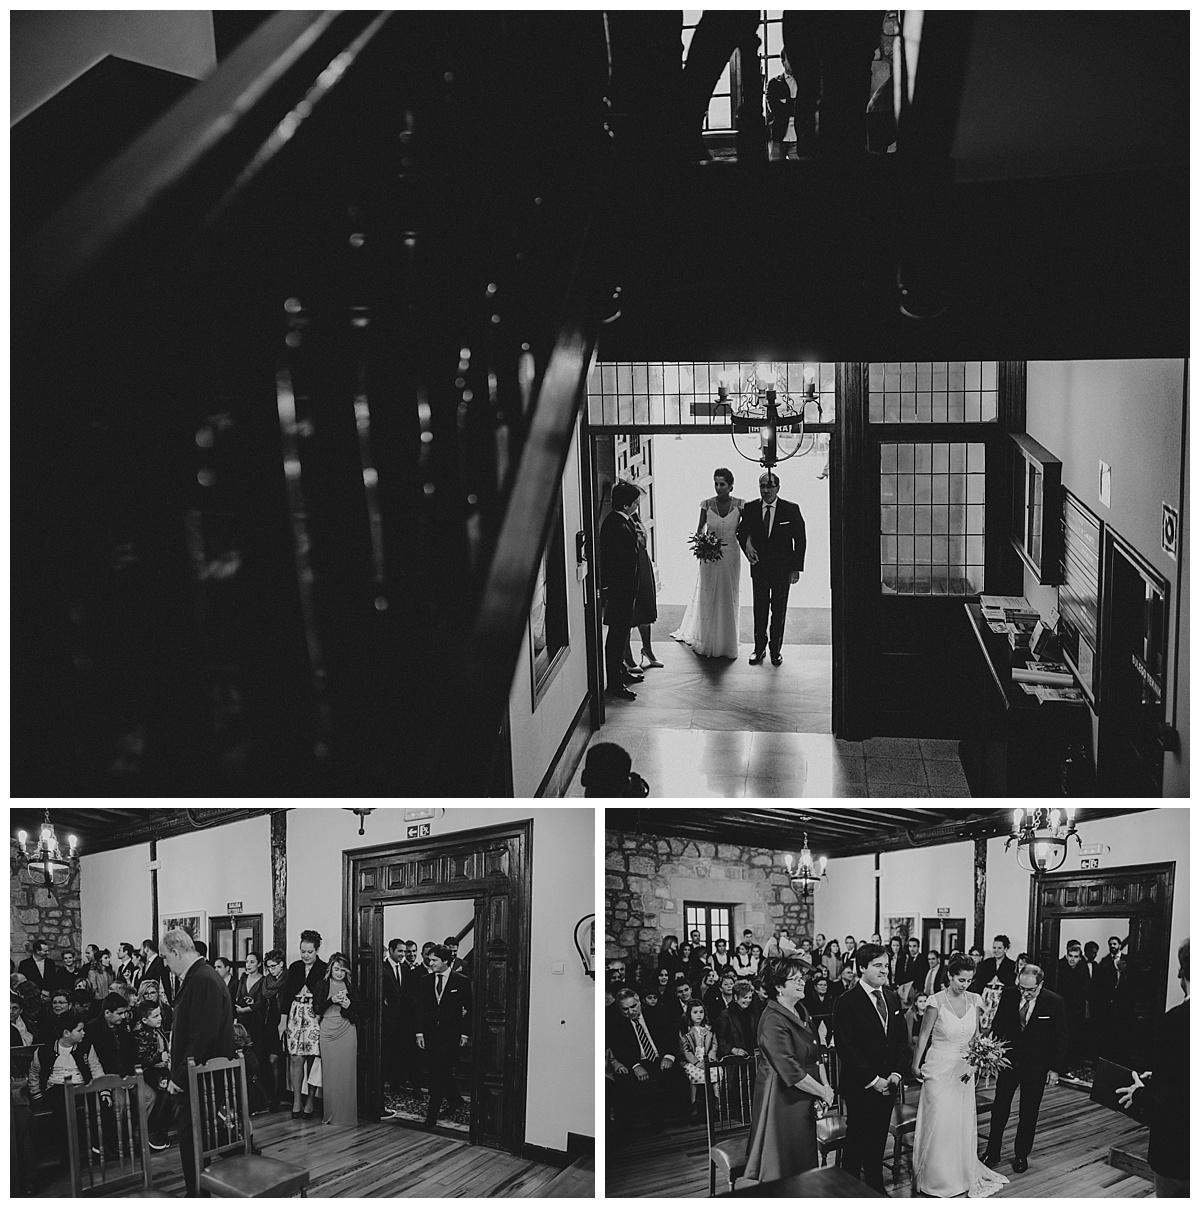 Inhar-Mutiozabal-Wedding-Photographer-Fotografo-Bodas-Zarautz_0023.jpg